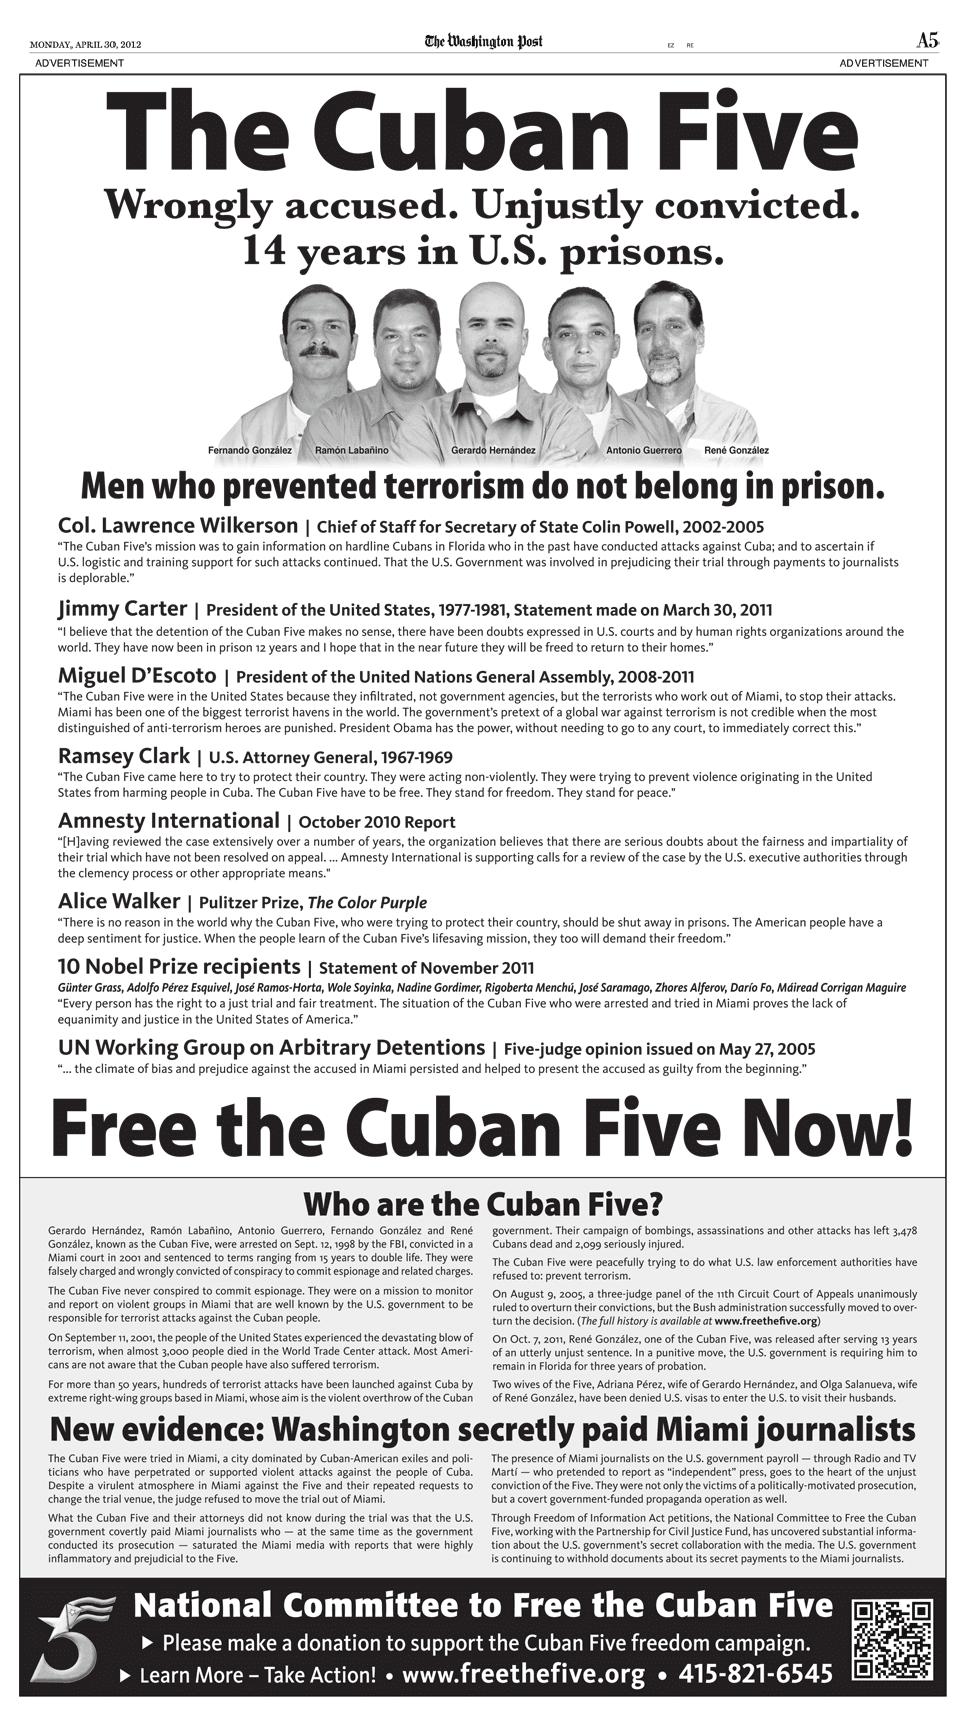 Washington Post ad